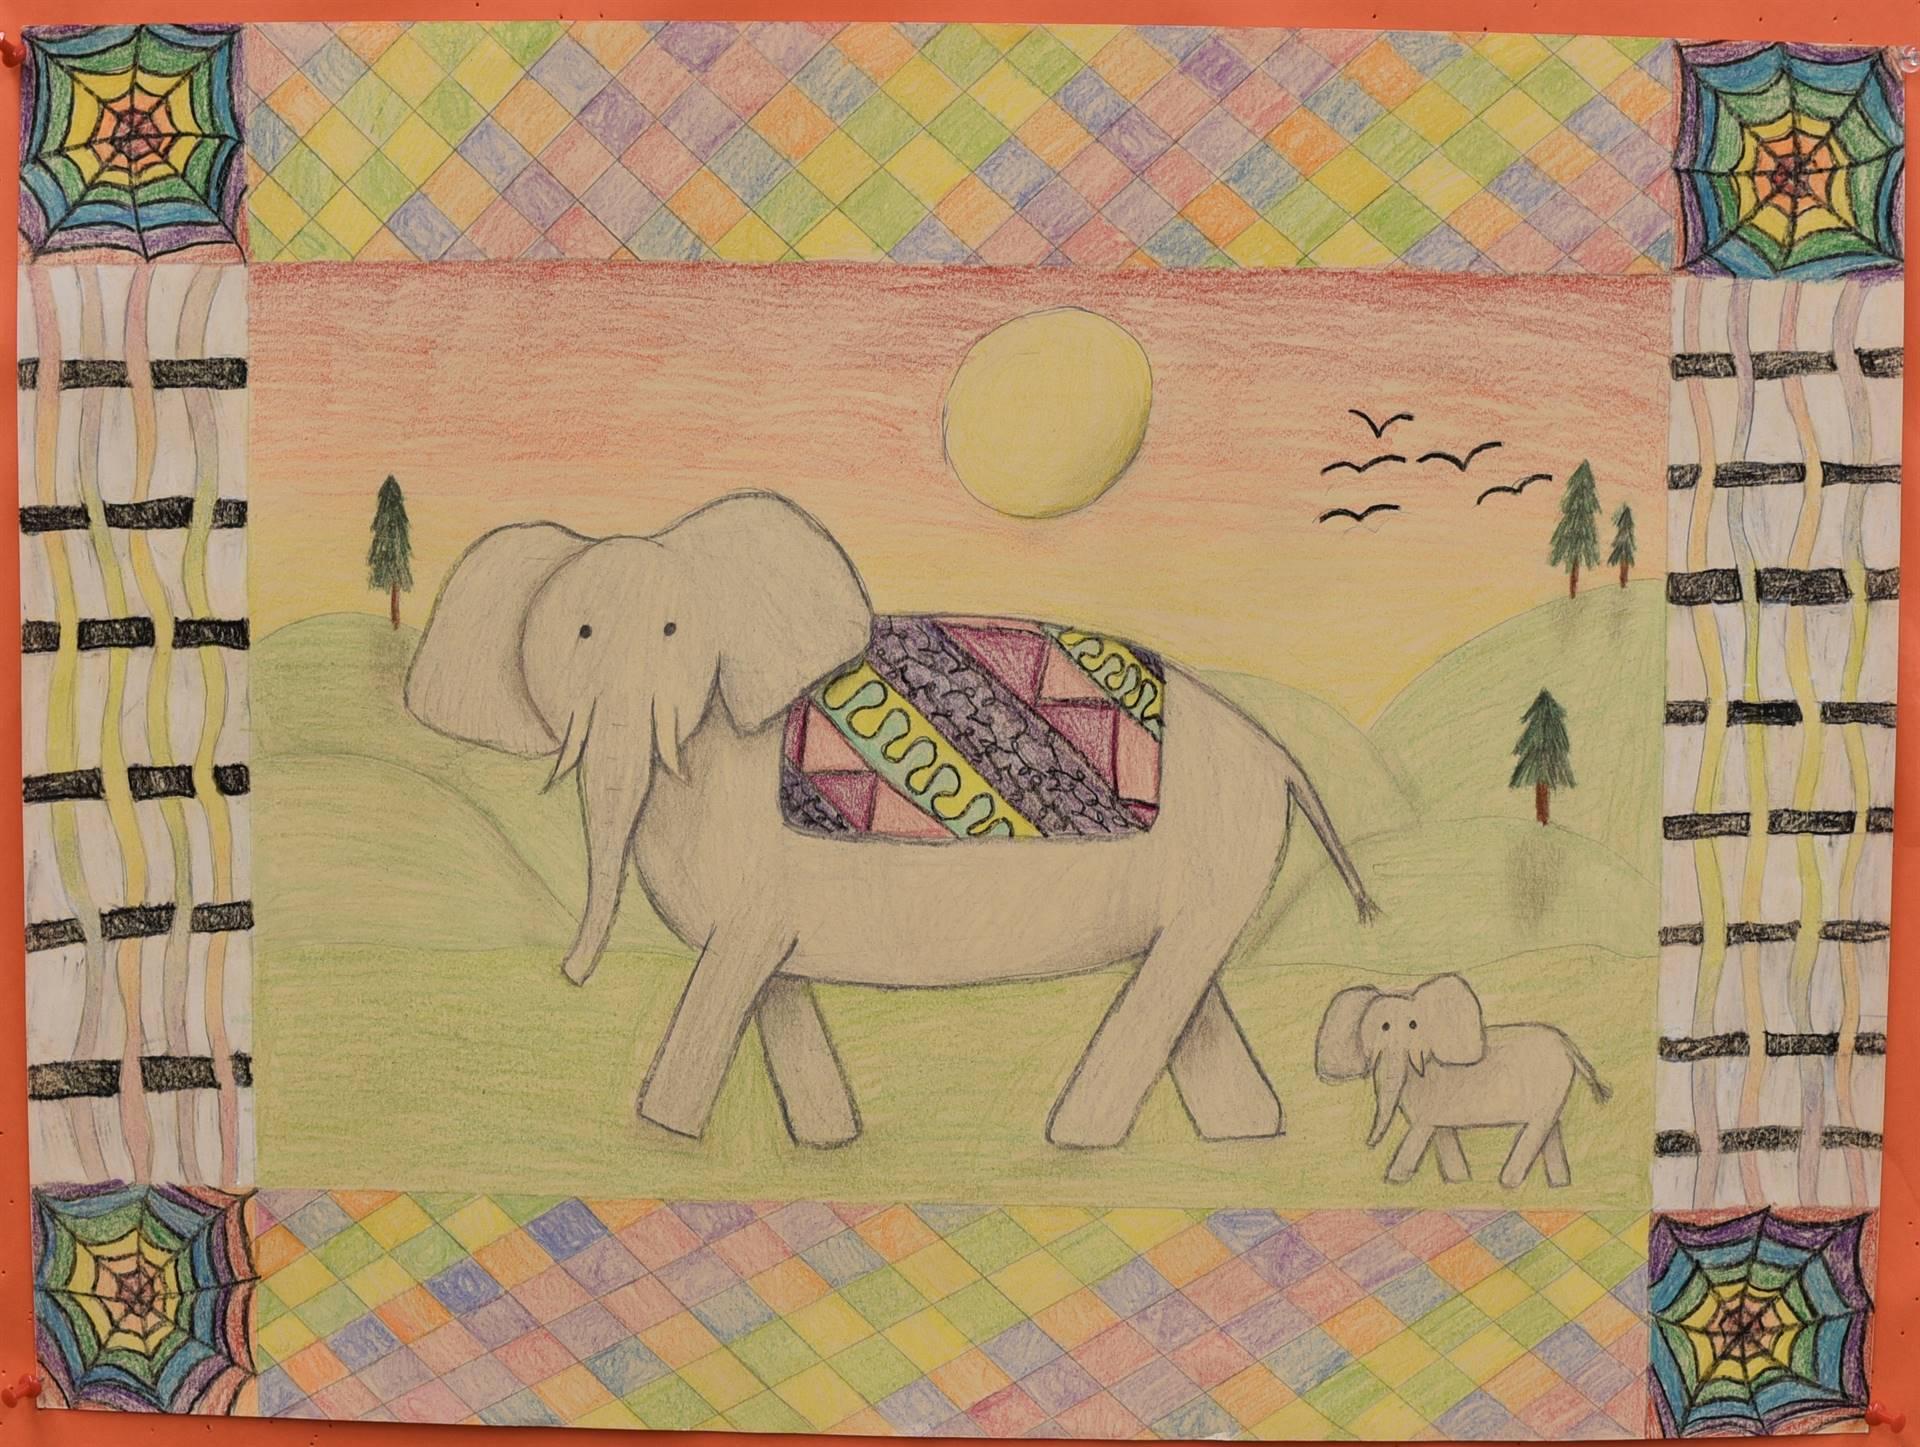 Brecksville-Broadview Hts. Middle School Art Projects 97